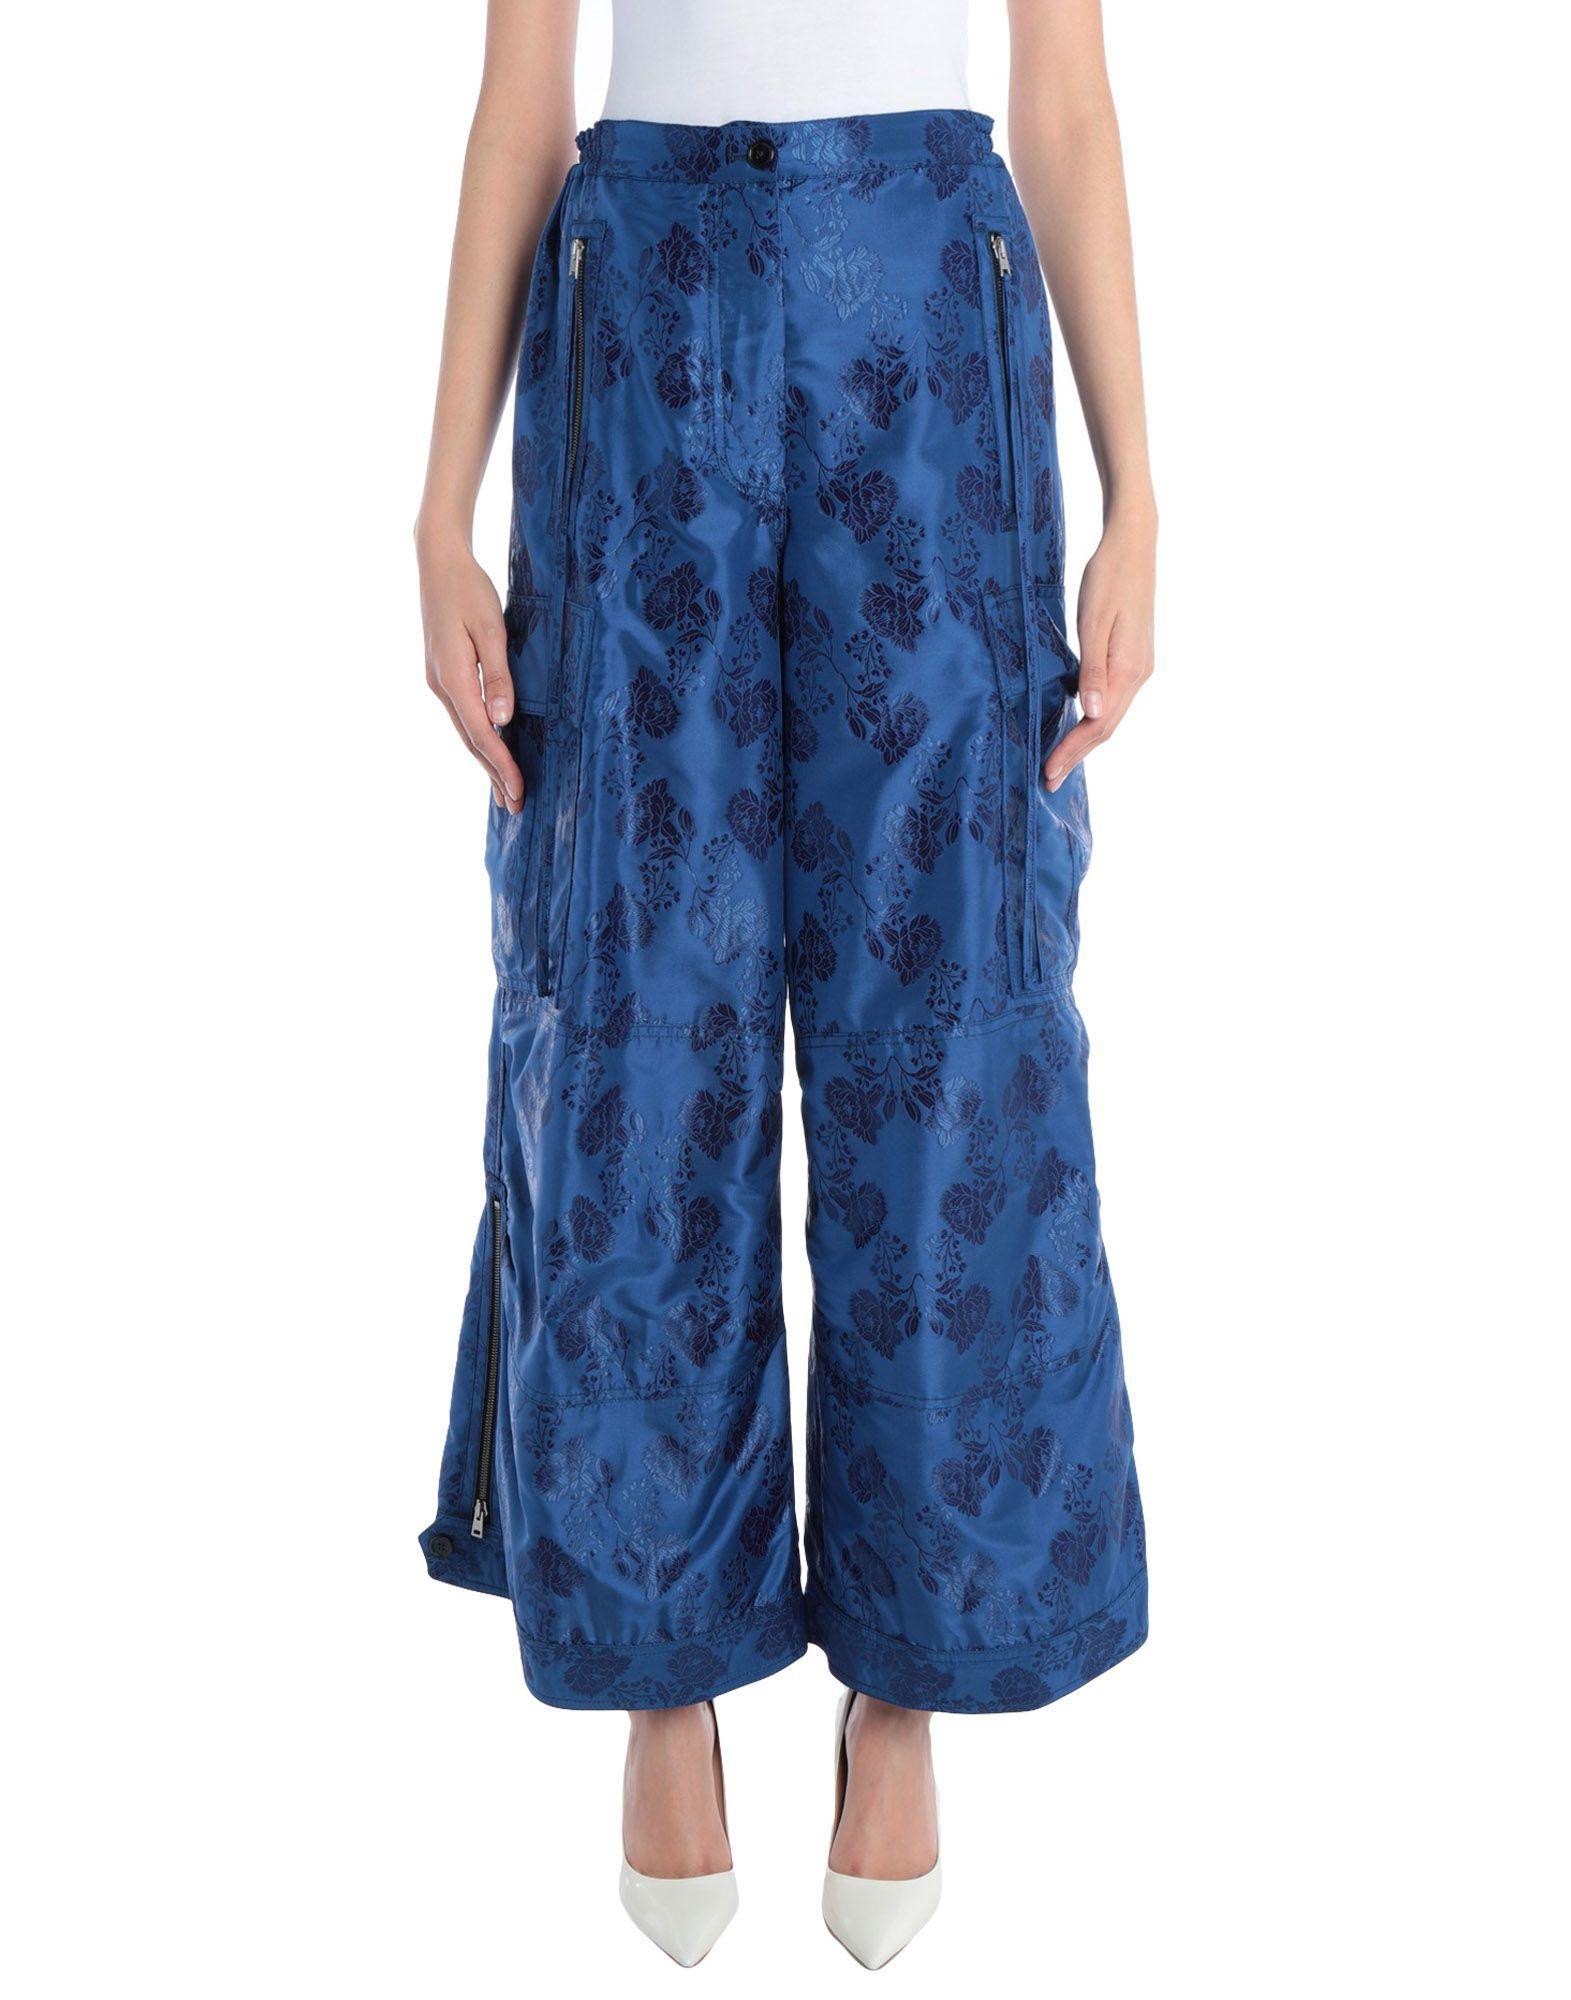 TROUSERS Woman Marni Blue Acetate